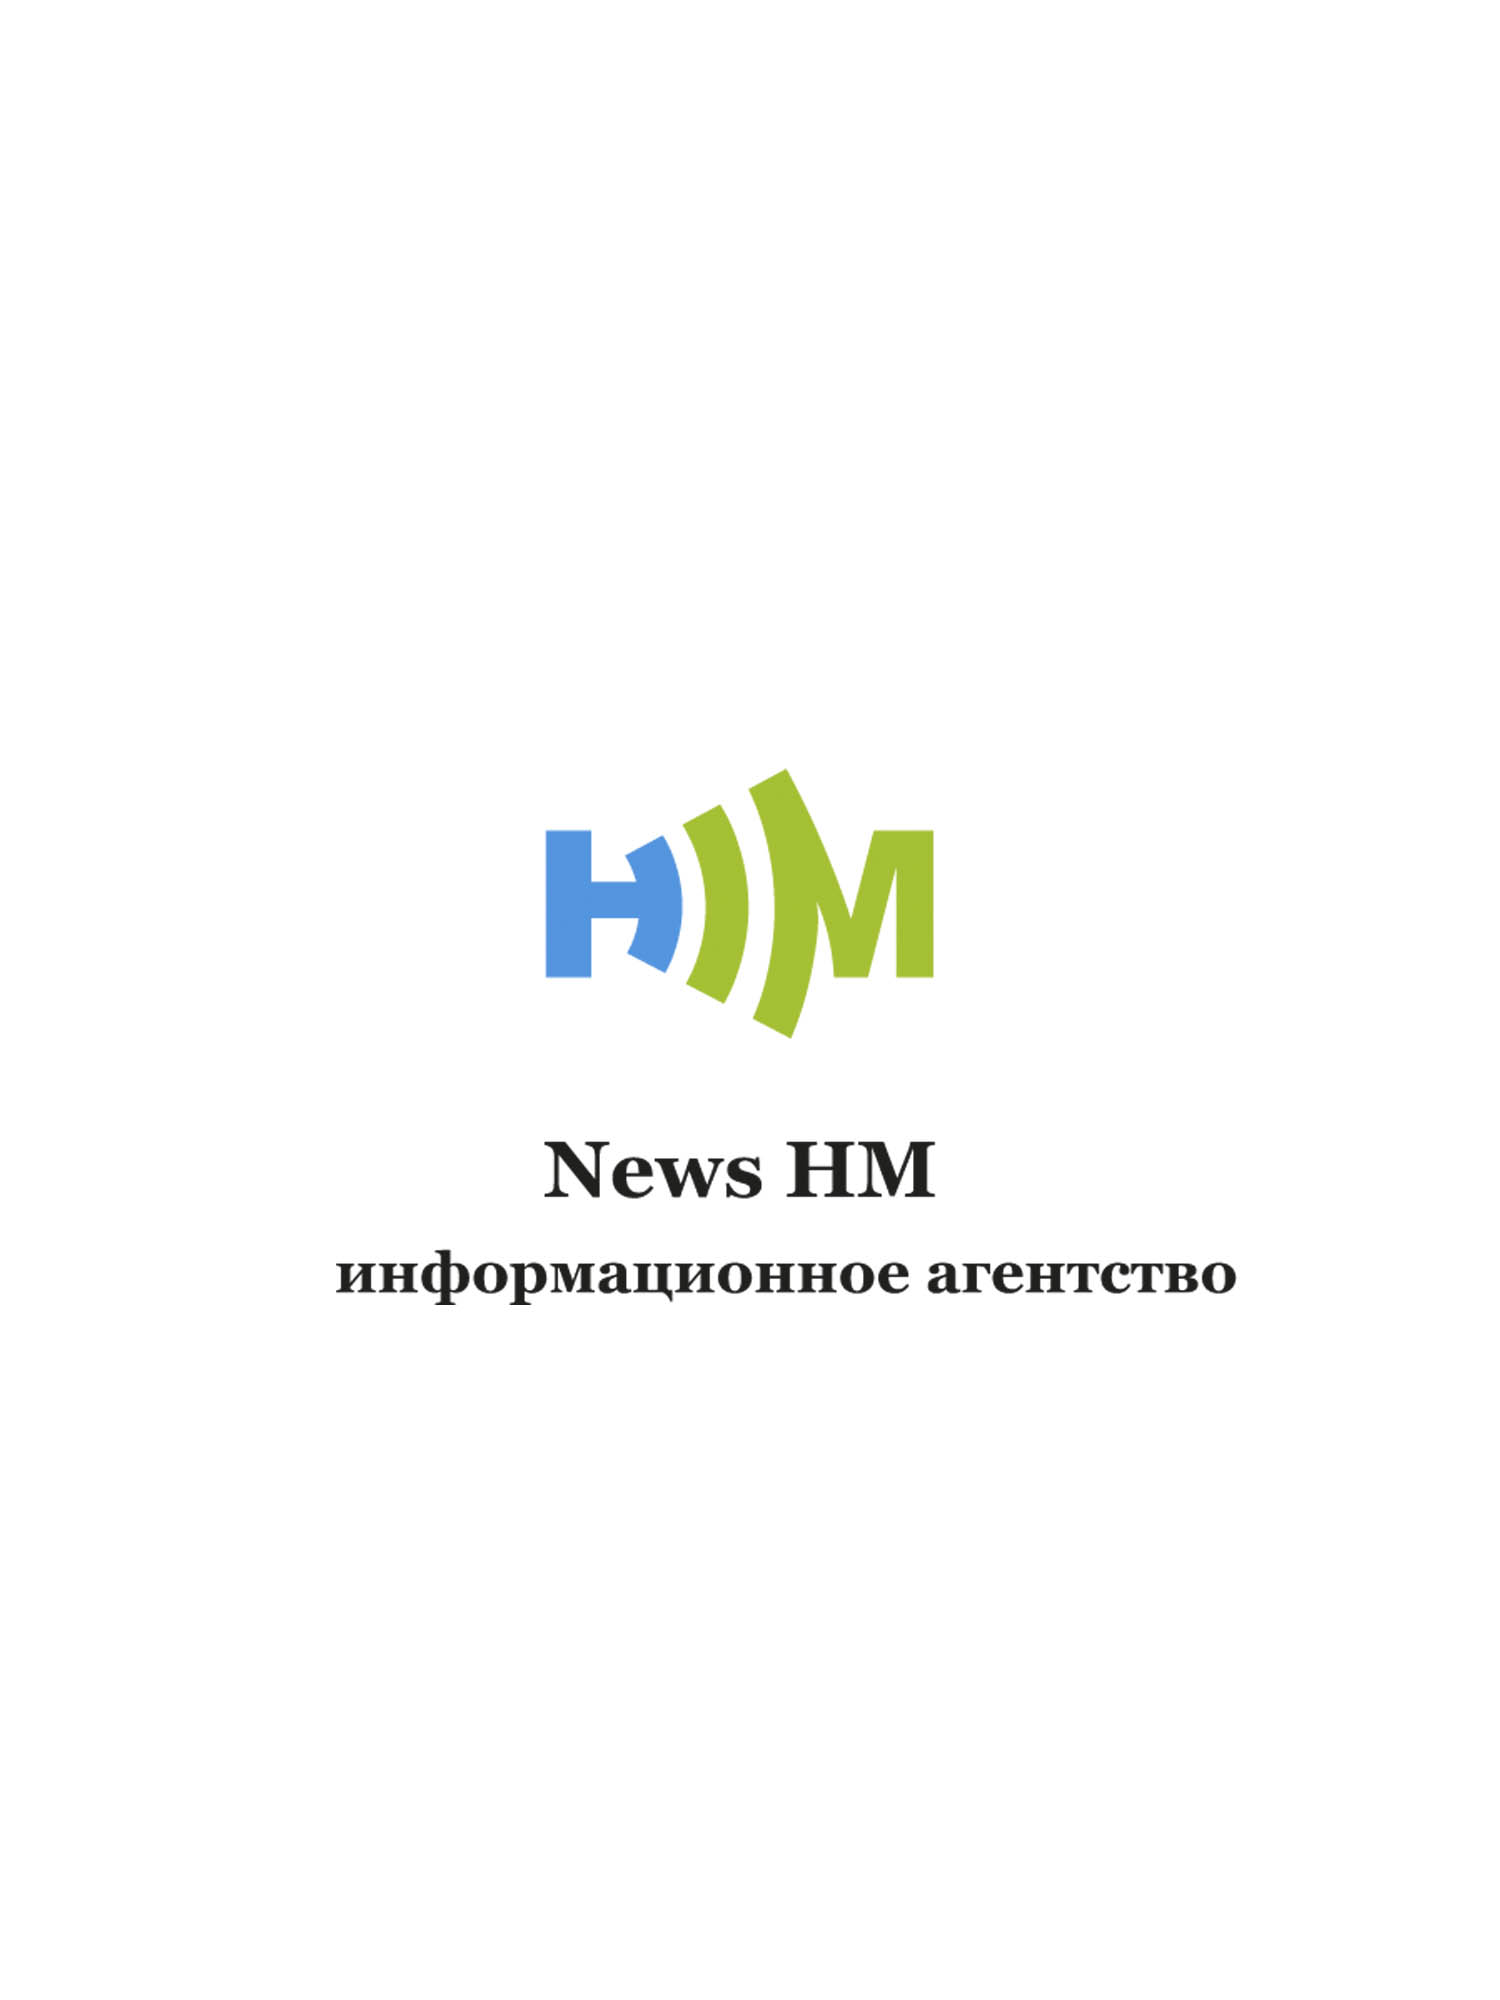 Логотип для информационного агентства фото f_9125aa58e81a9626.jpg